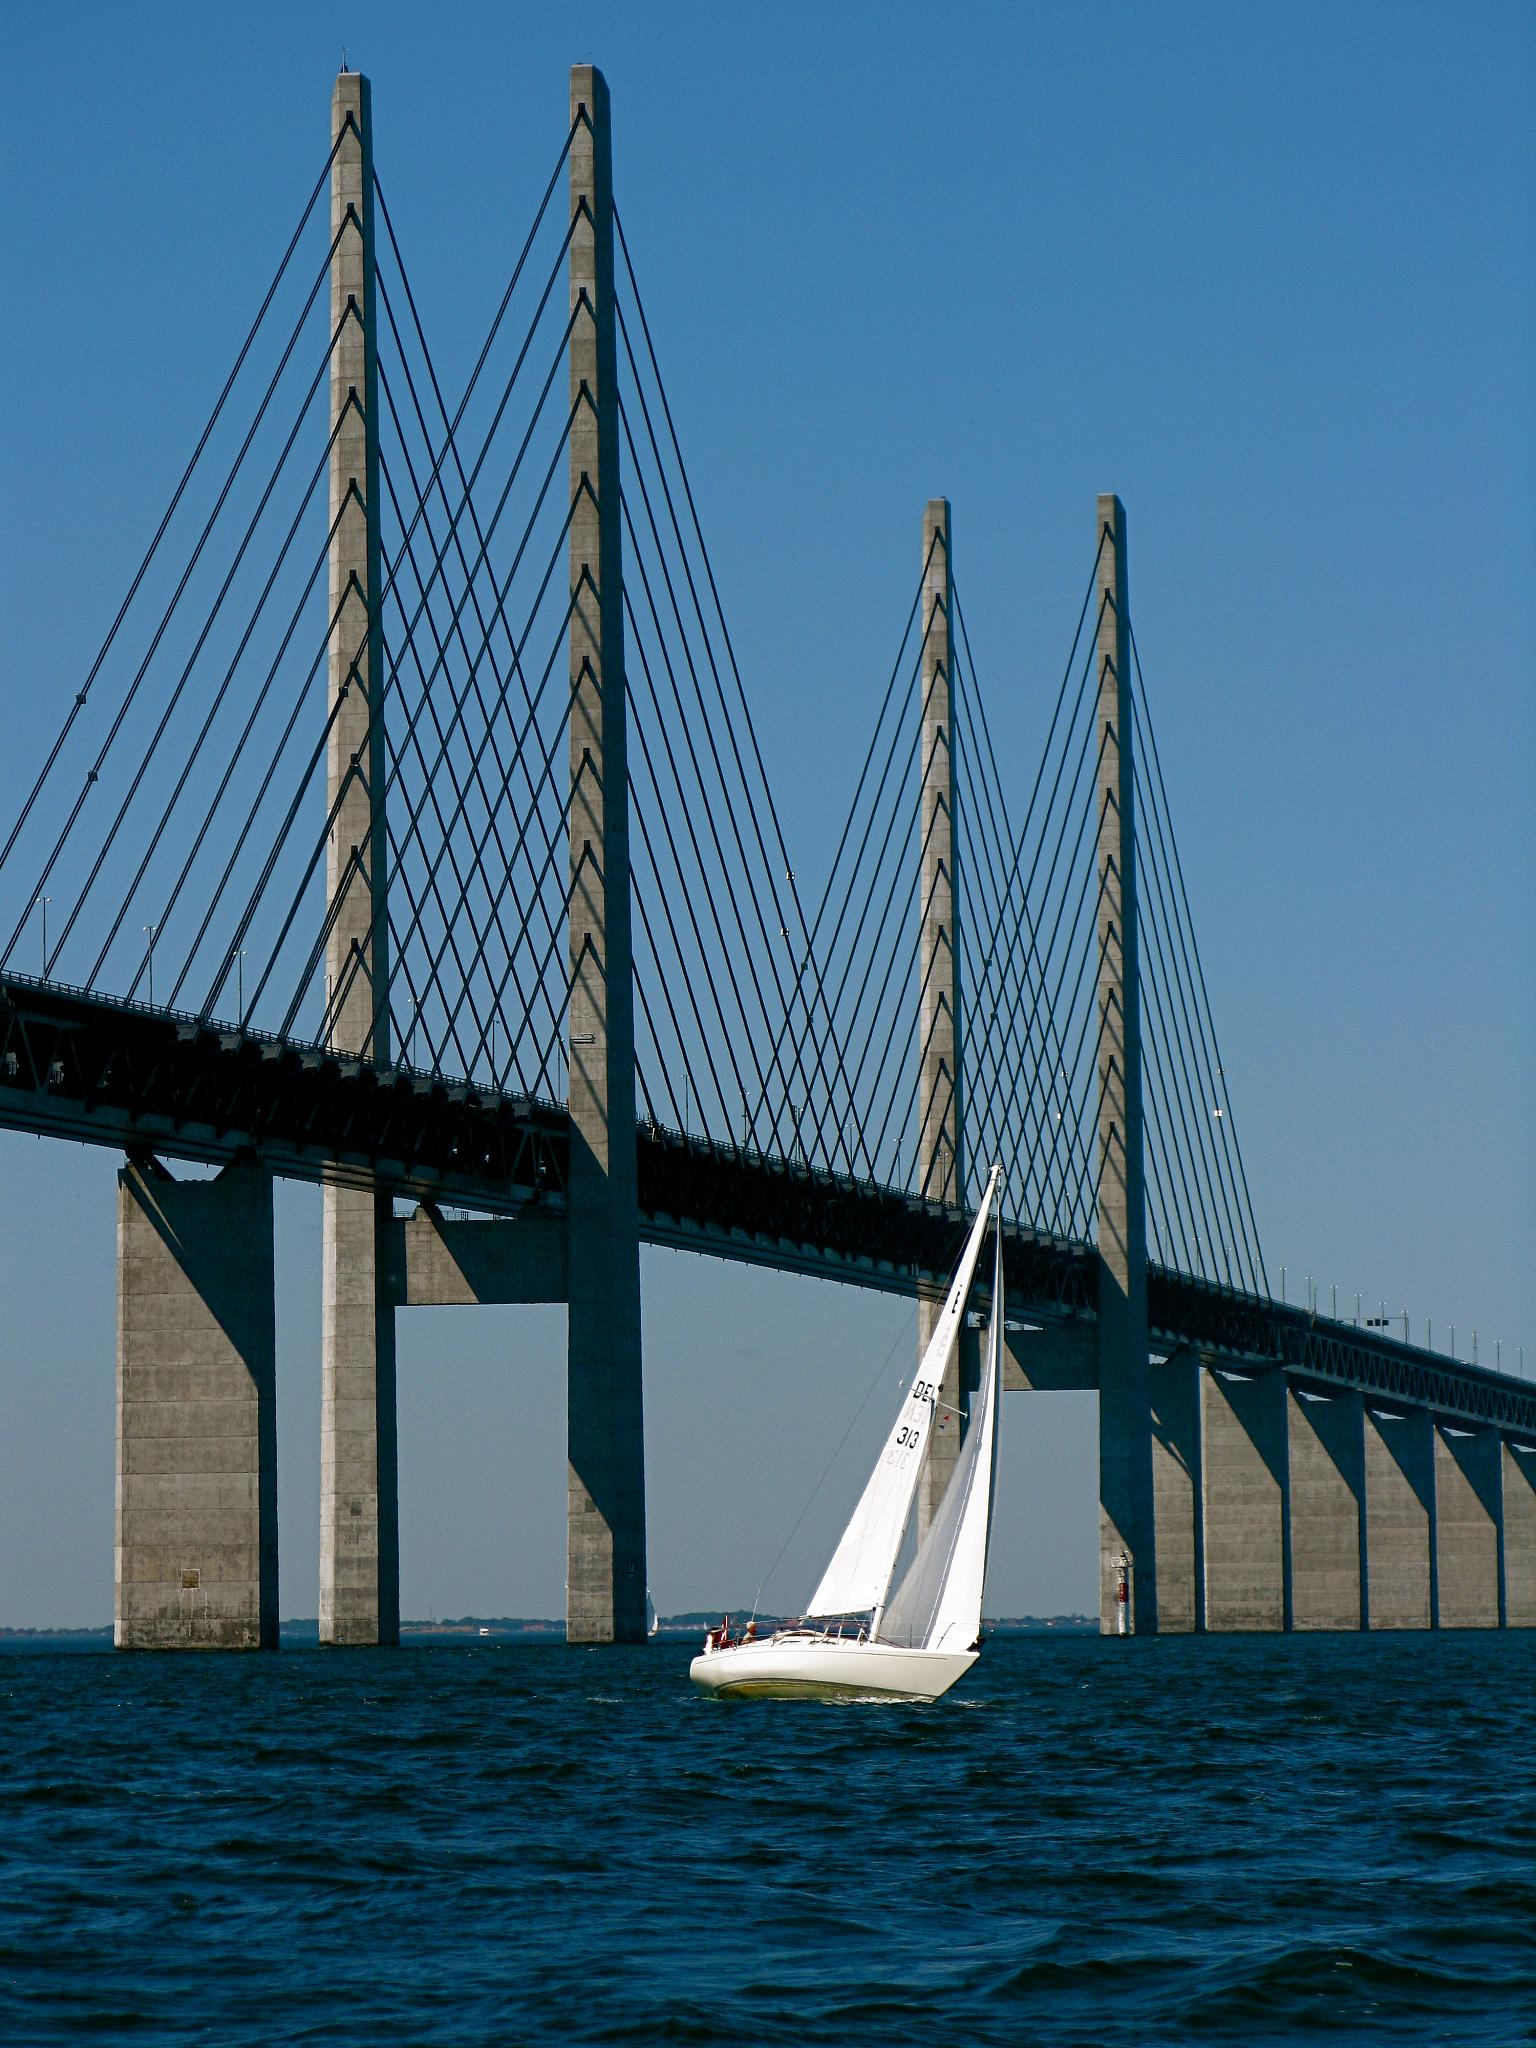 Arhitektura koja spaja ljude - Mostovi Under_the_bridge_-_Oresund_Bridge